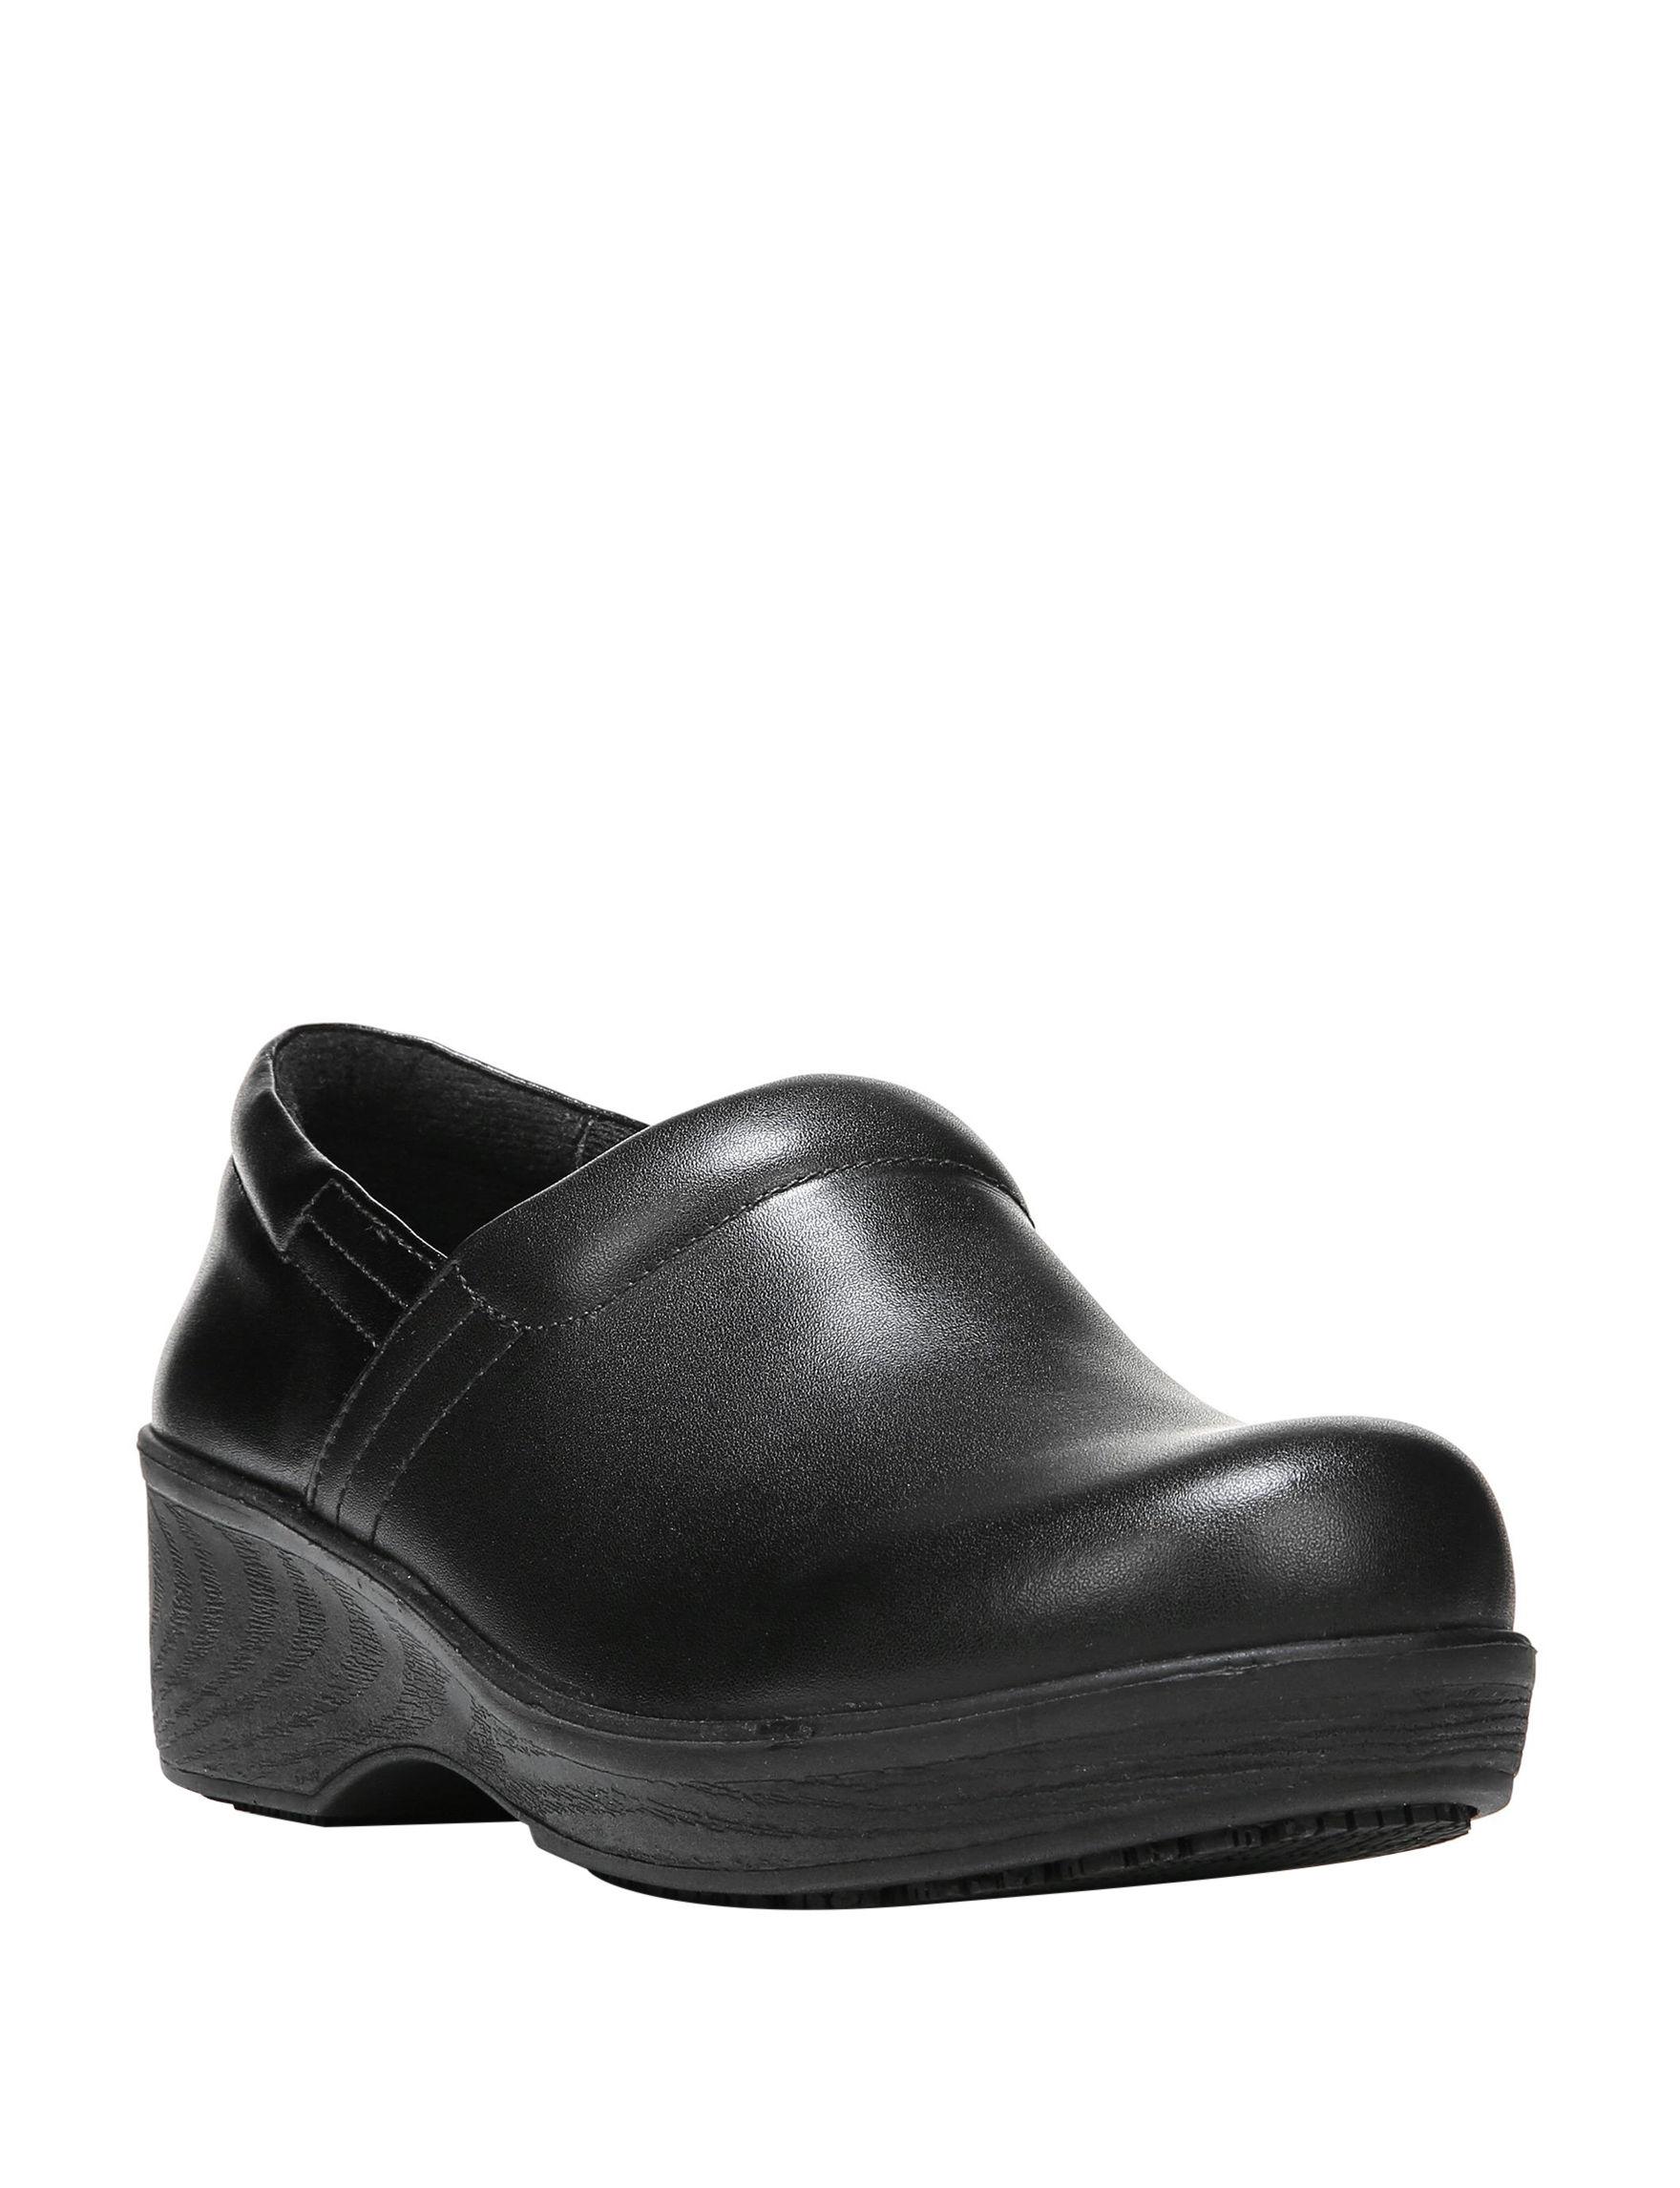 Dr. Scholl's Black Slip Resistant